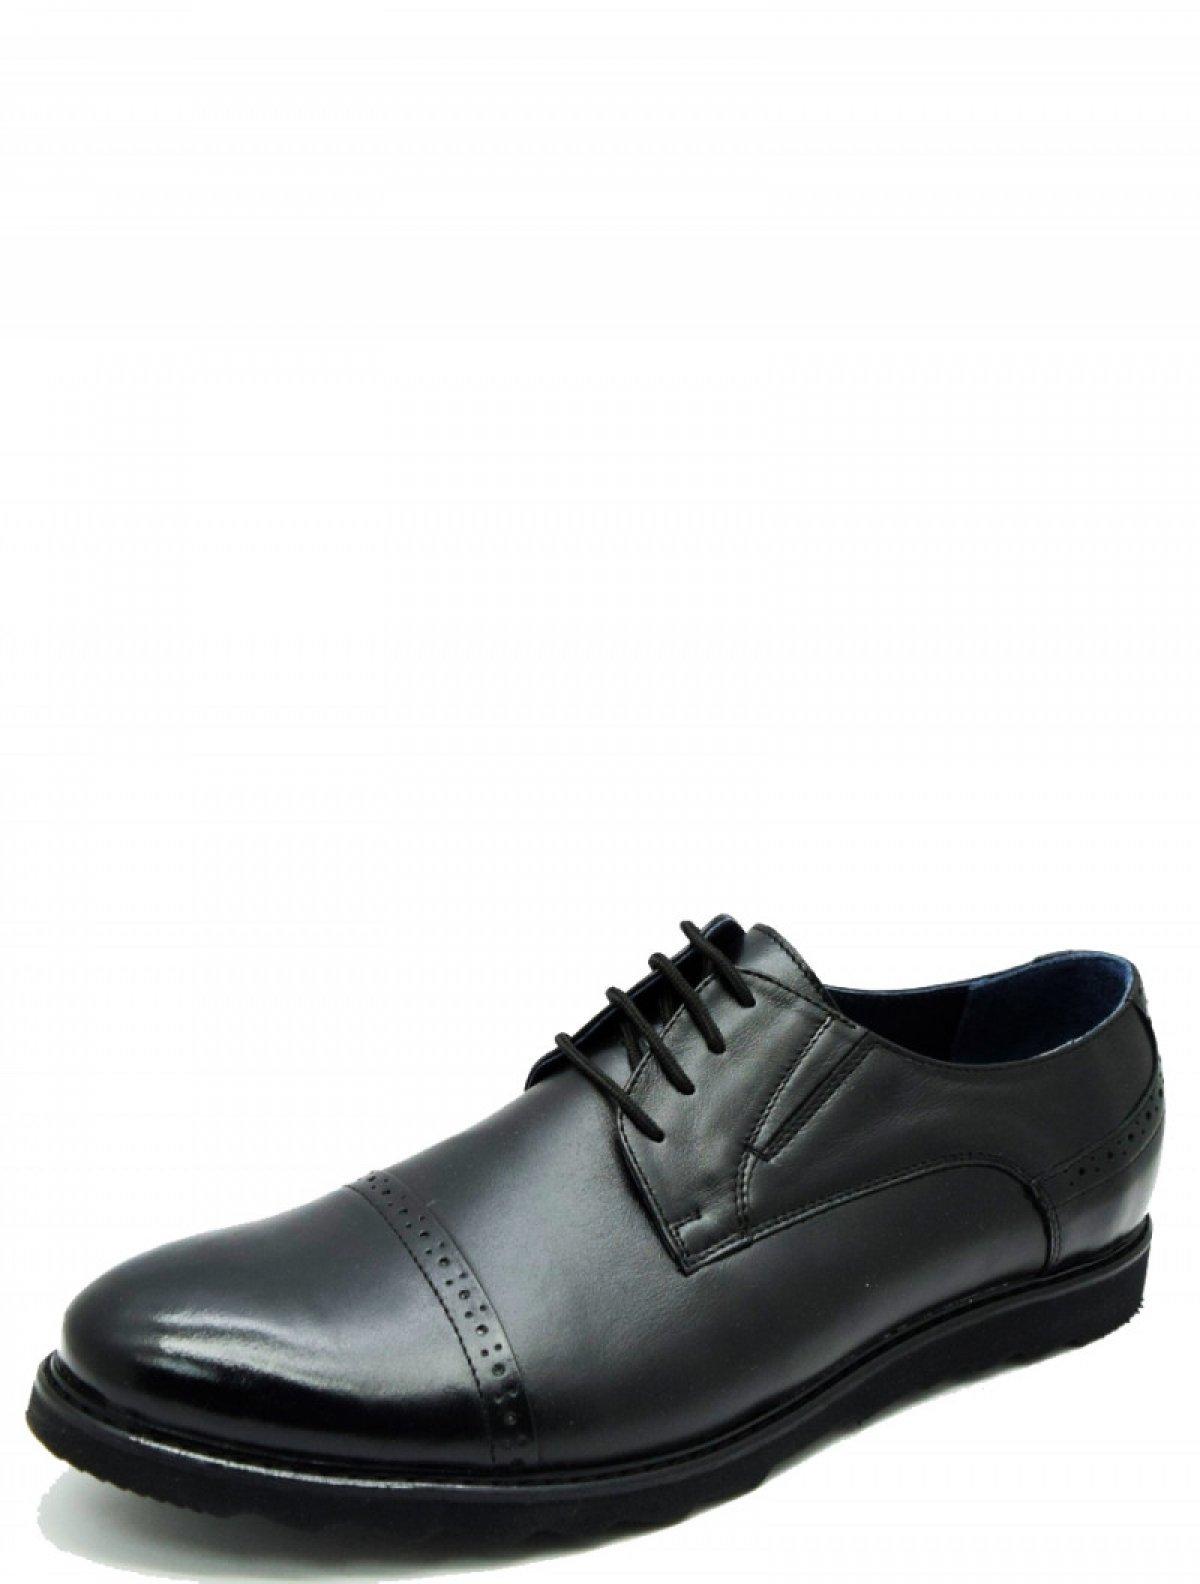 Richly 3030-1-1 мужские туфли